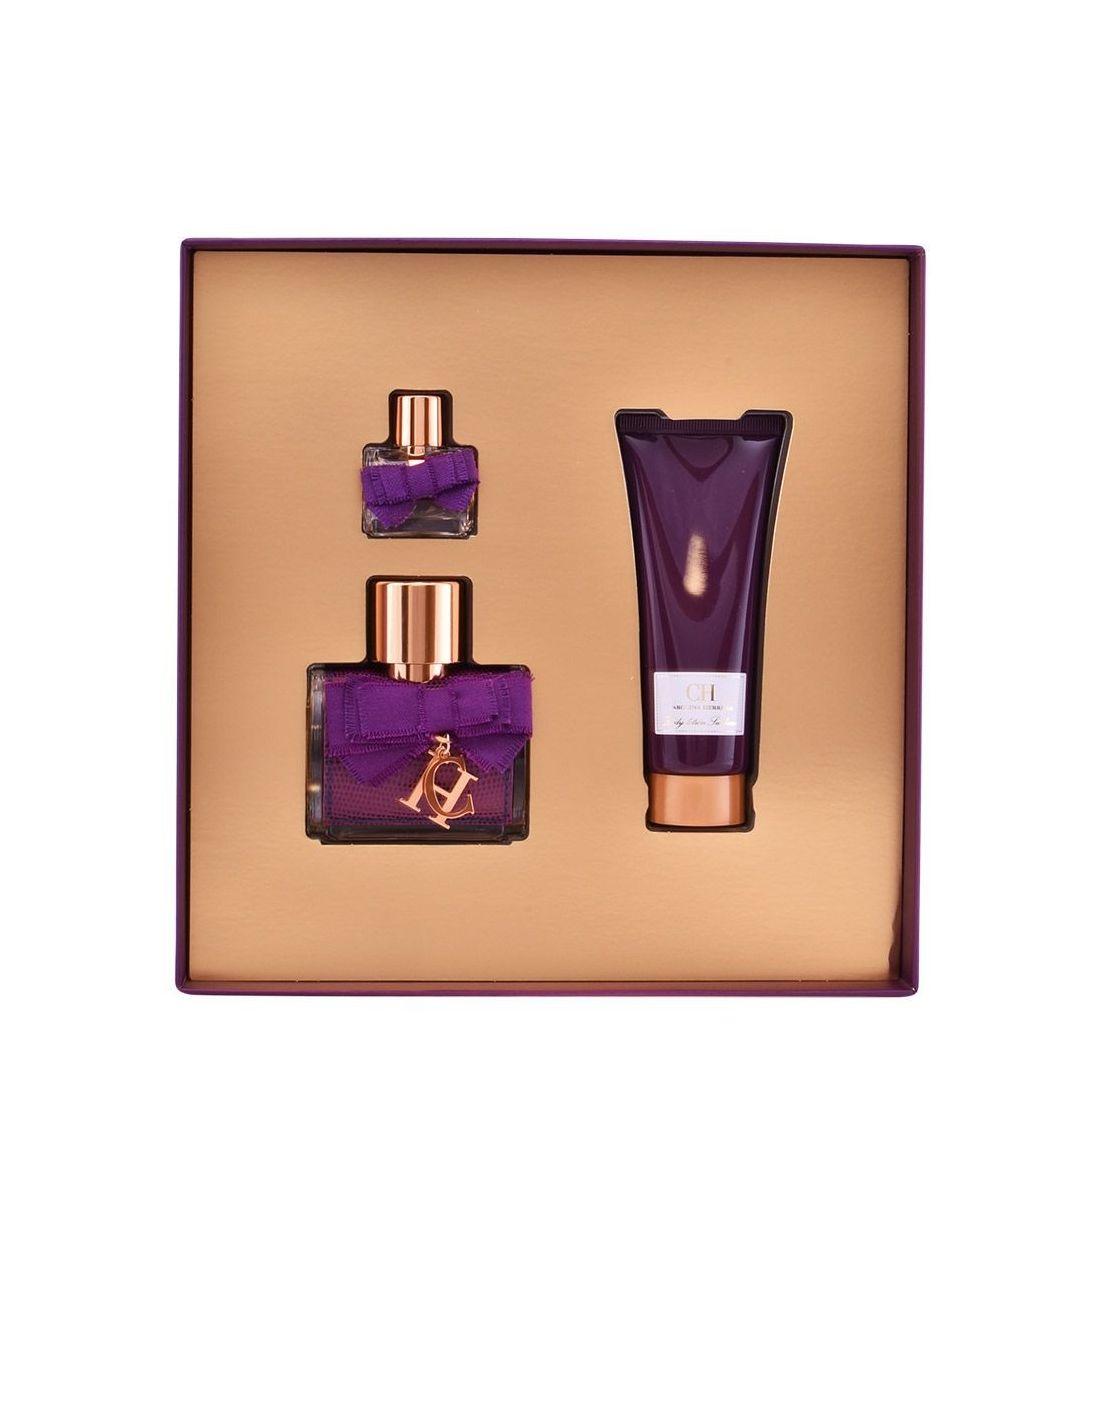 ecbfbb90d9bc4 Coffret Carolina Herrera Sublime Eau de Parfum 50 ml + Body Lotion 75 ml +  Edp